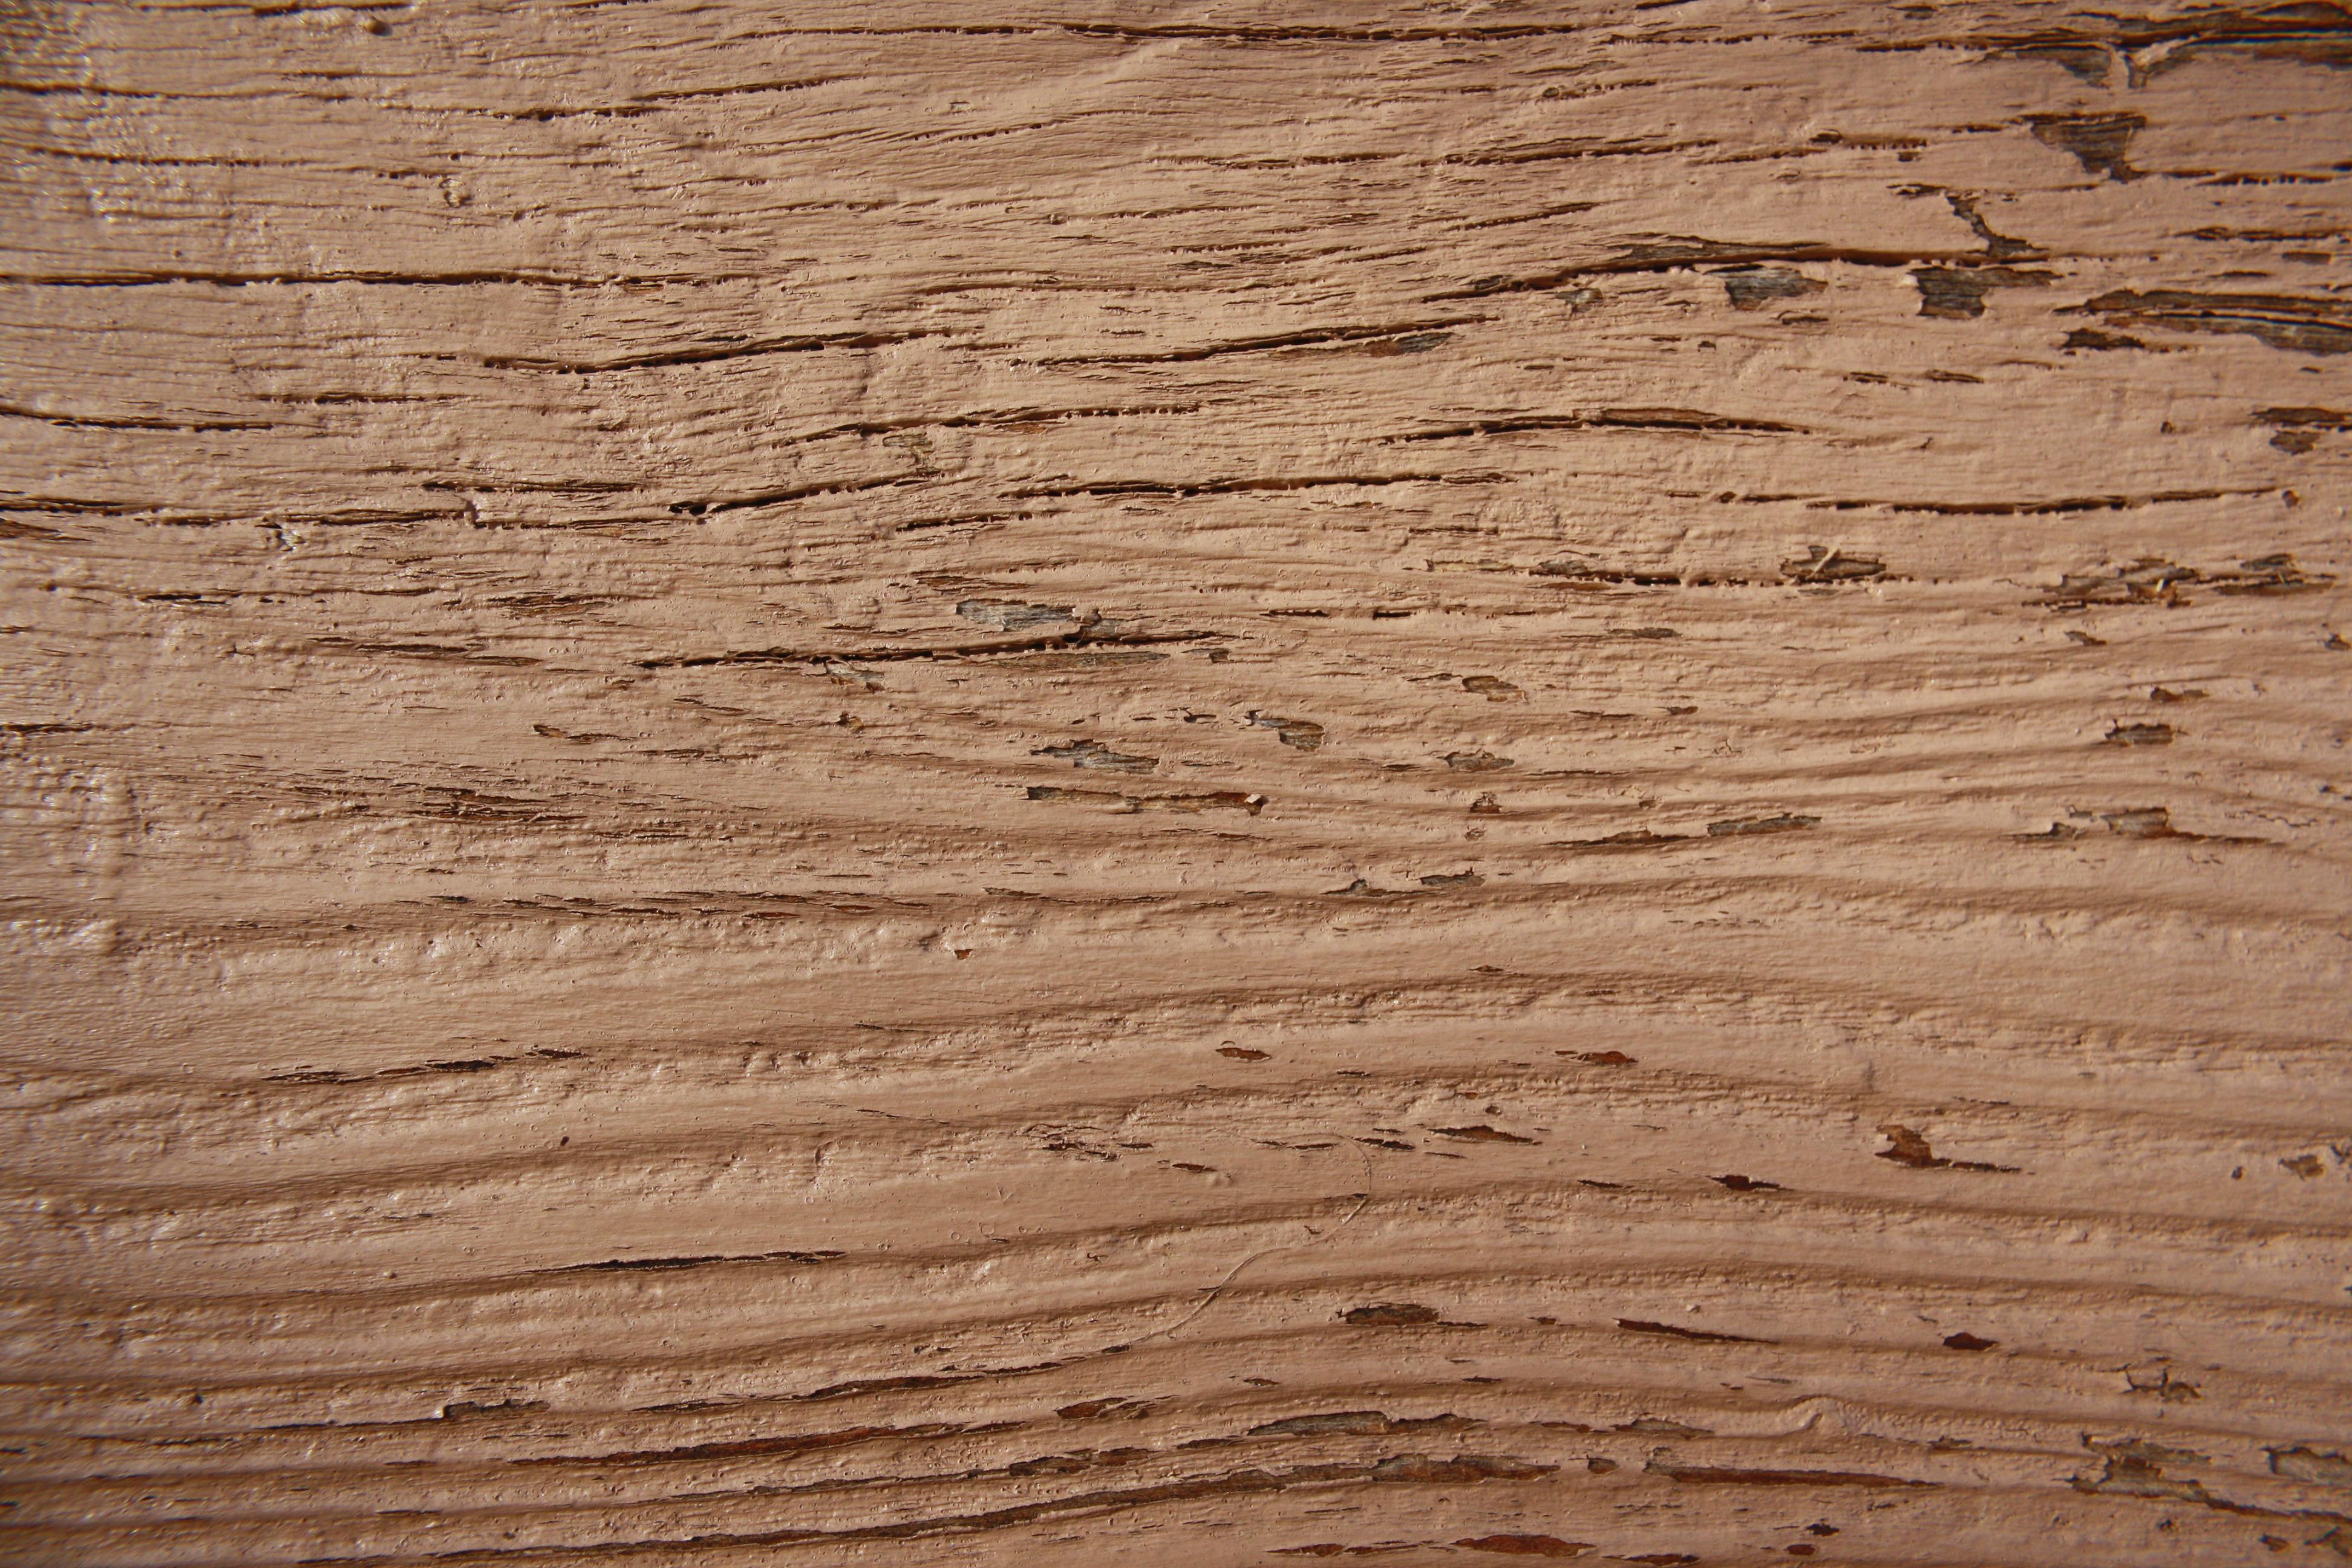 Wood Grain Closeup Texture with Brown Peeling Paint ...